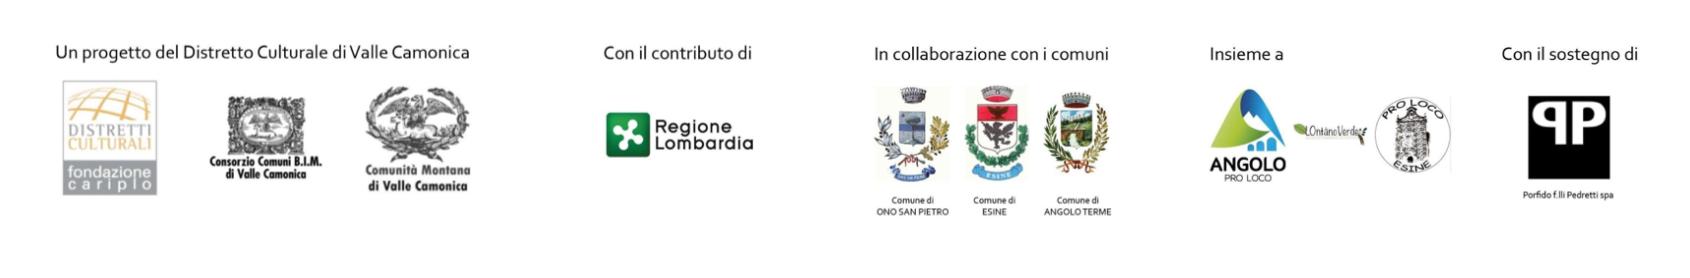 Loghi patrocinii S/TONES Valle Camonica